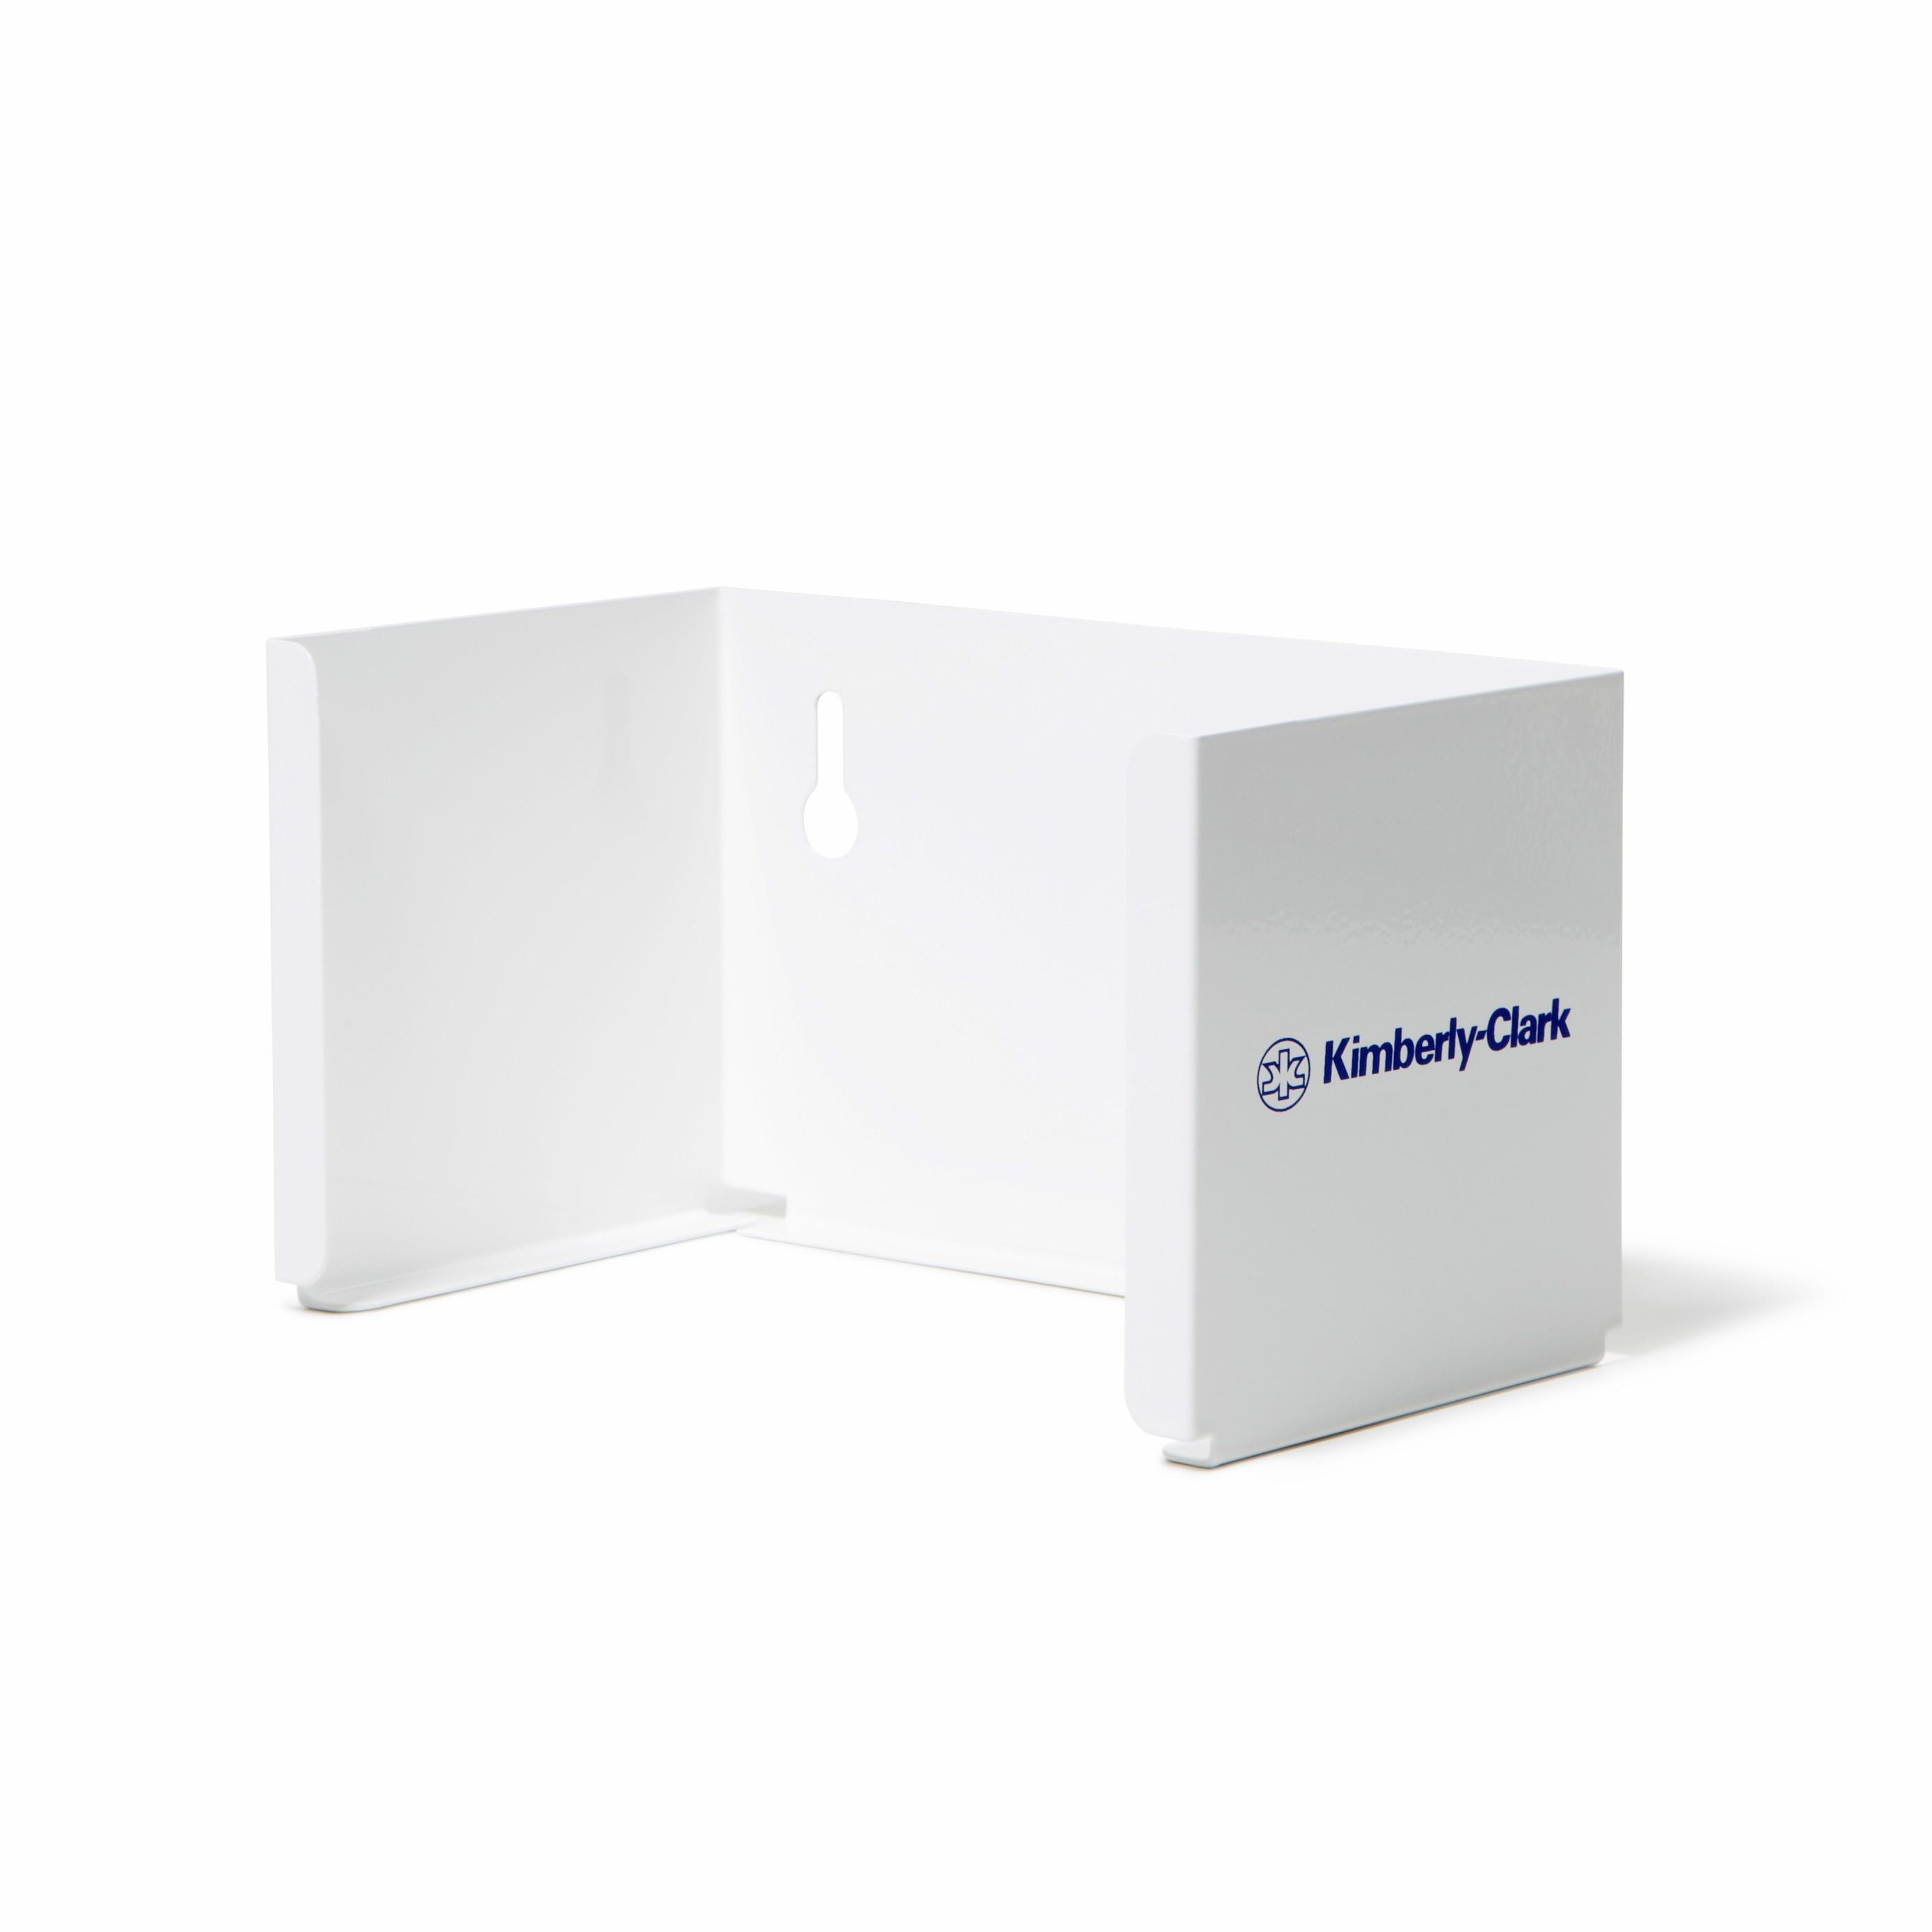 pack of 1 Apron Dispenser 14 Shield